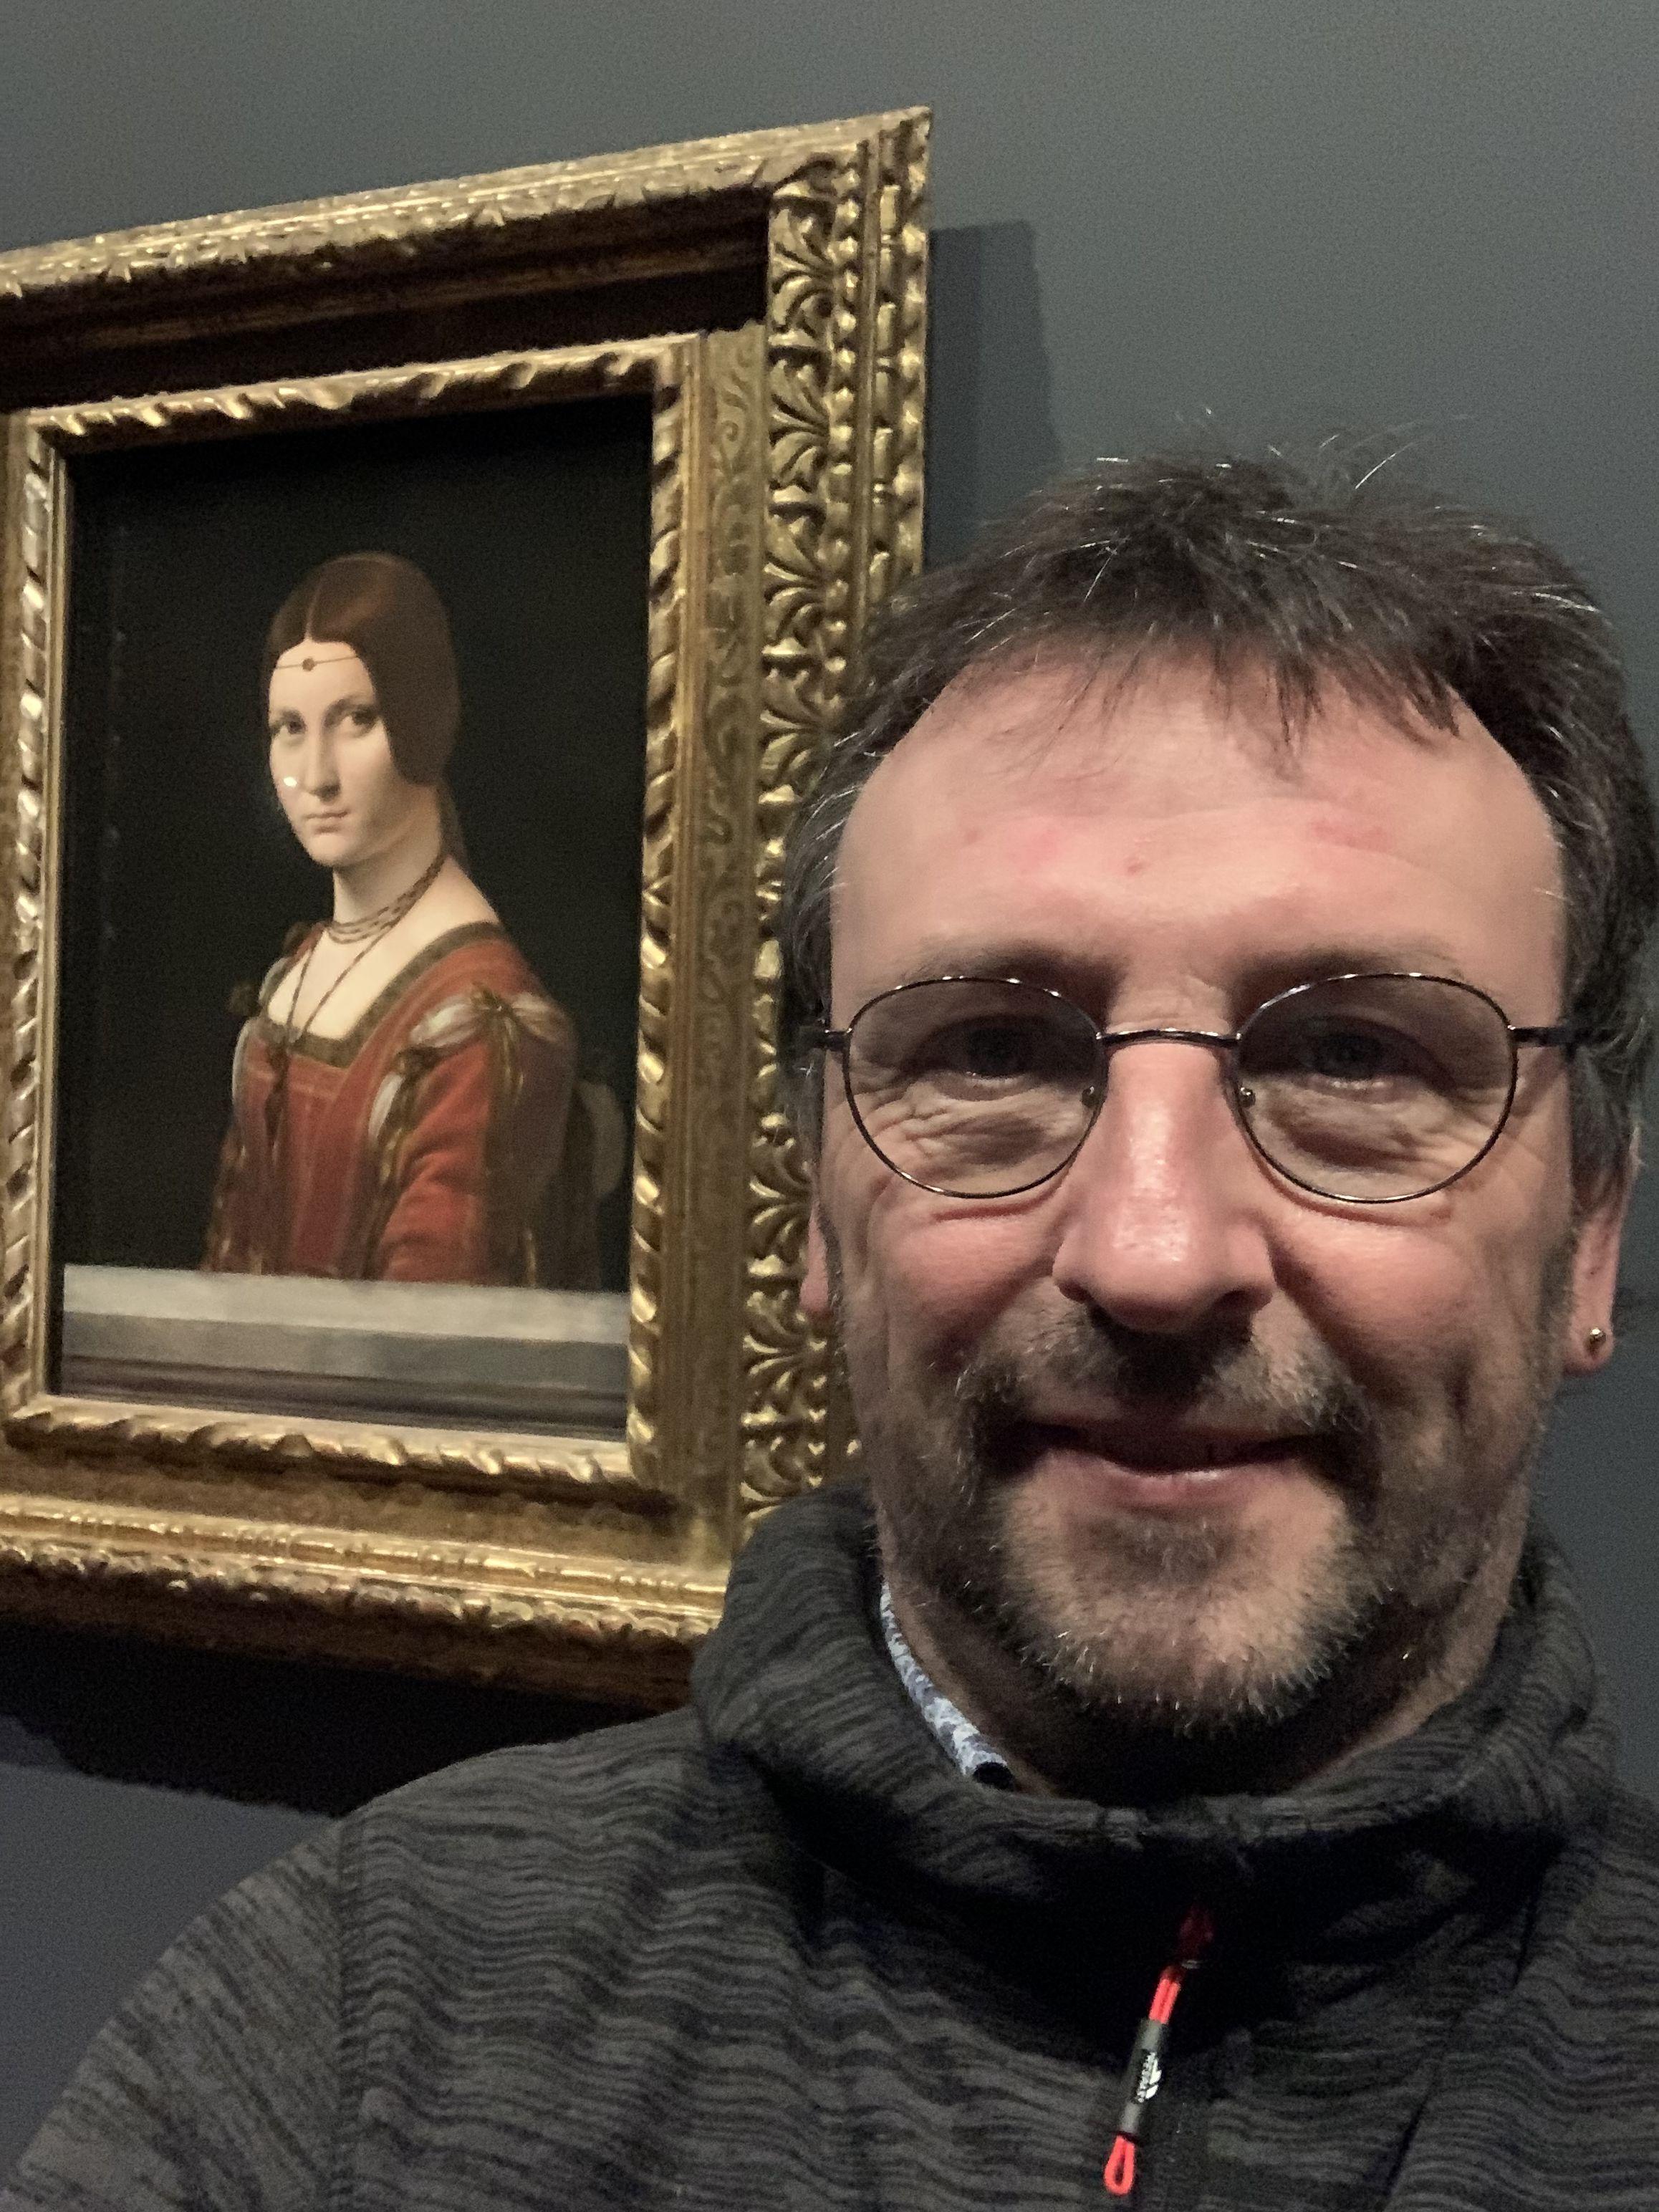 Leonardo Da Vinci Exhibition in Paris